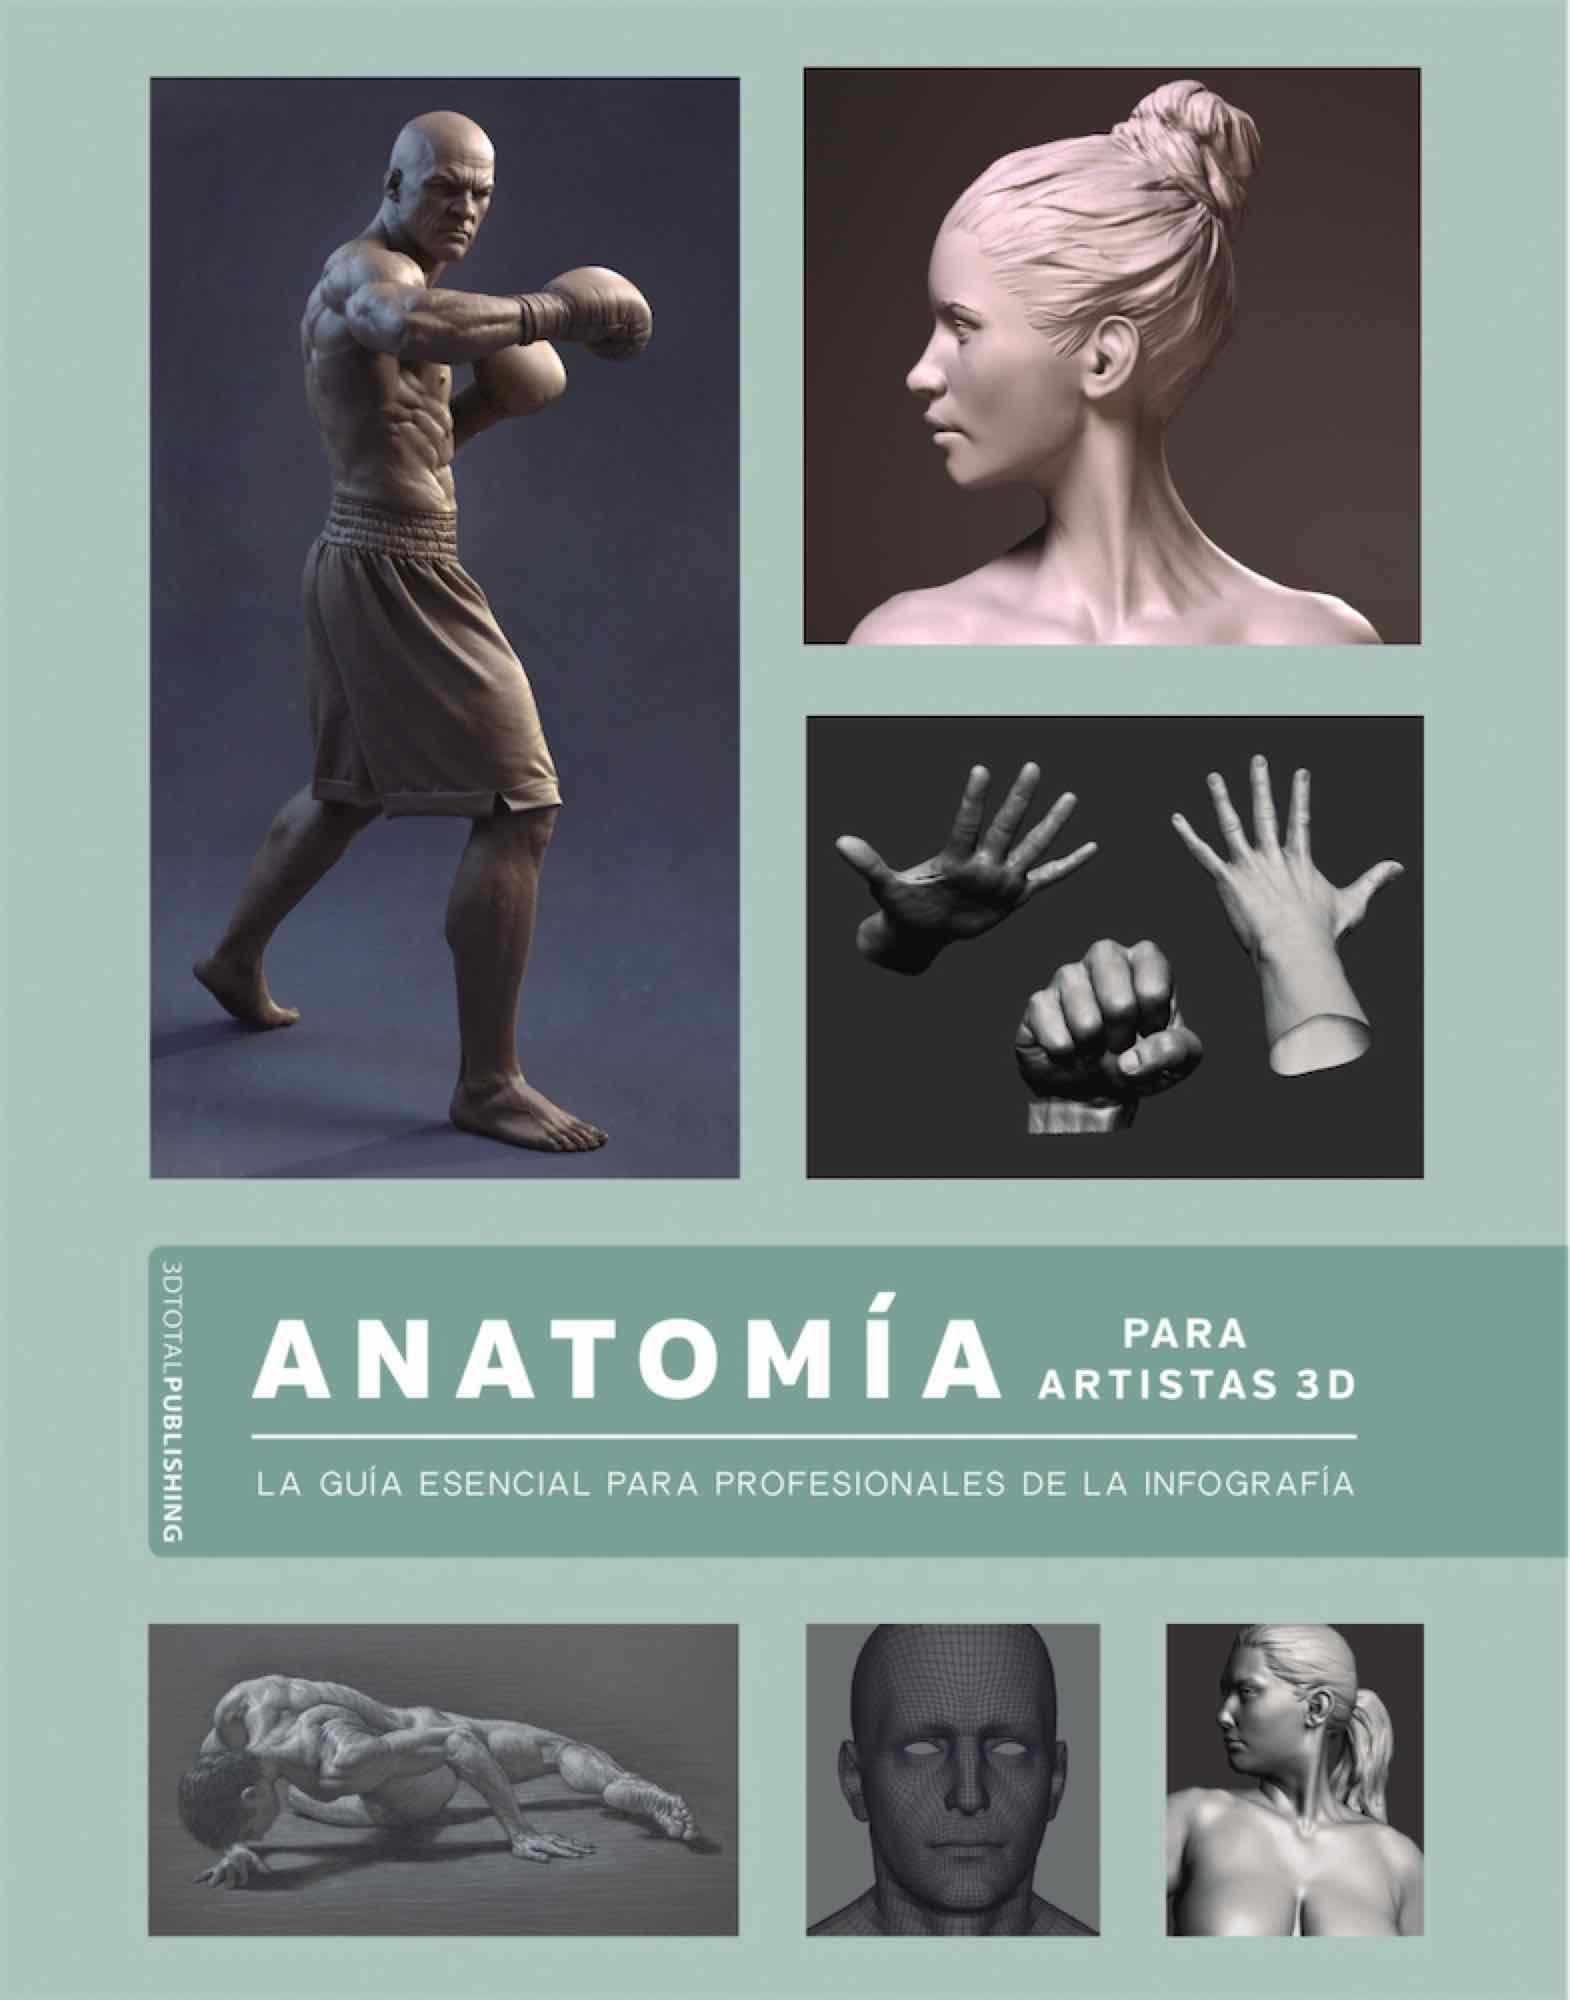 ANATOMIA PARA ARTISTAS 3D